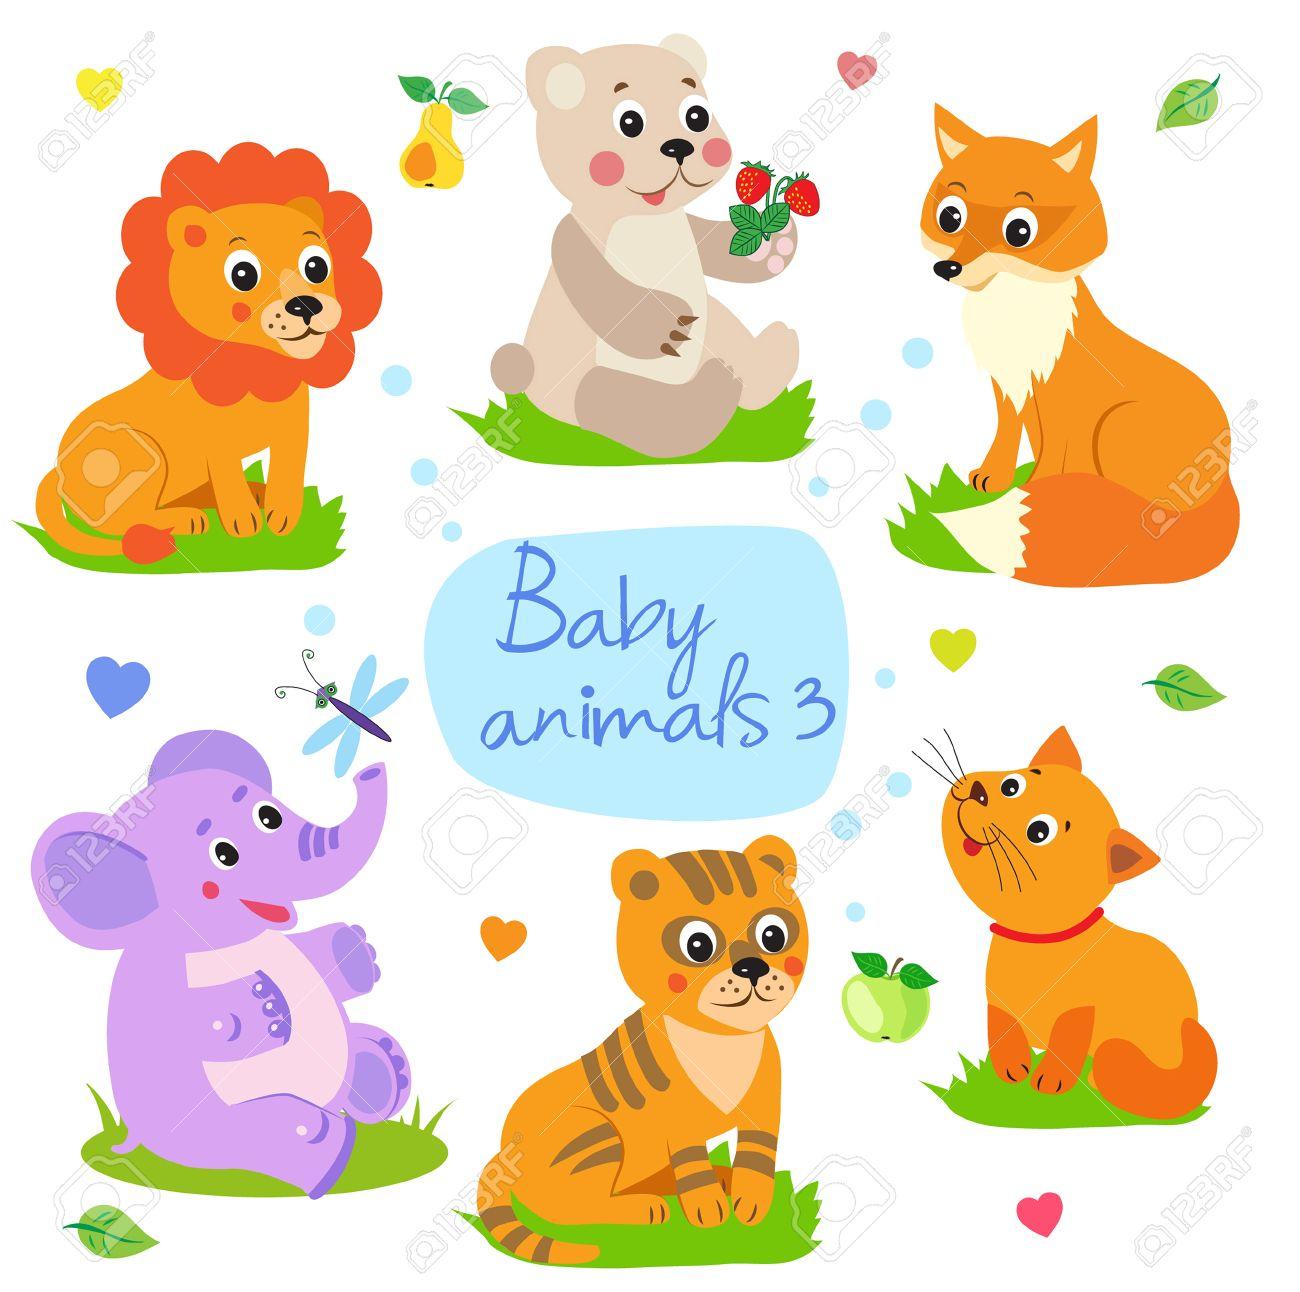 Animales Del Bebé: León, Oso, Zorro, Elefante, Tigre, Gato. Conjunto ...